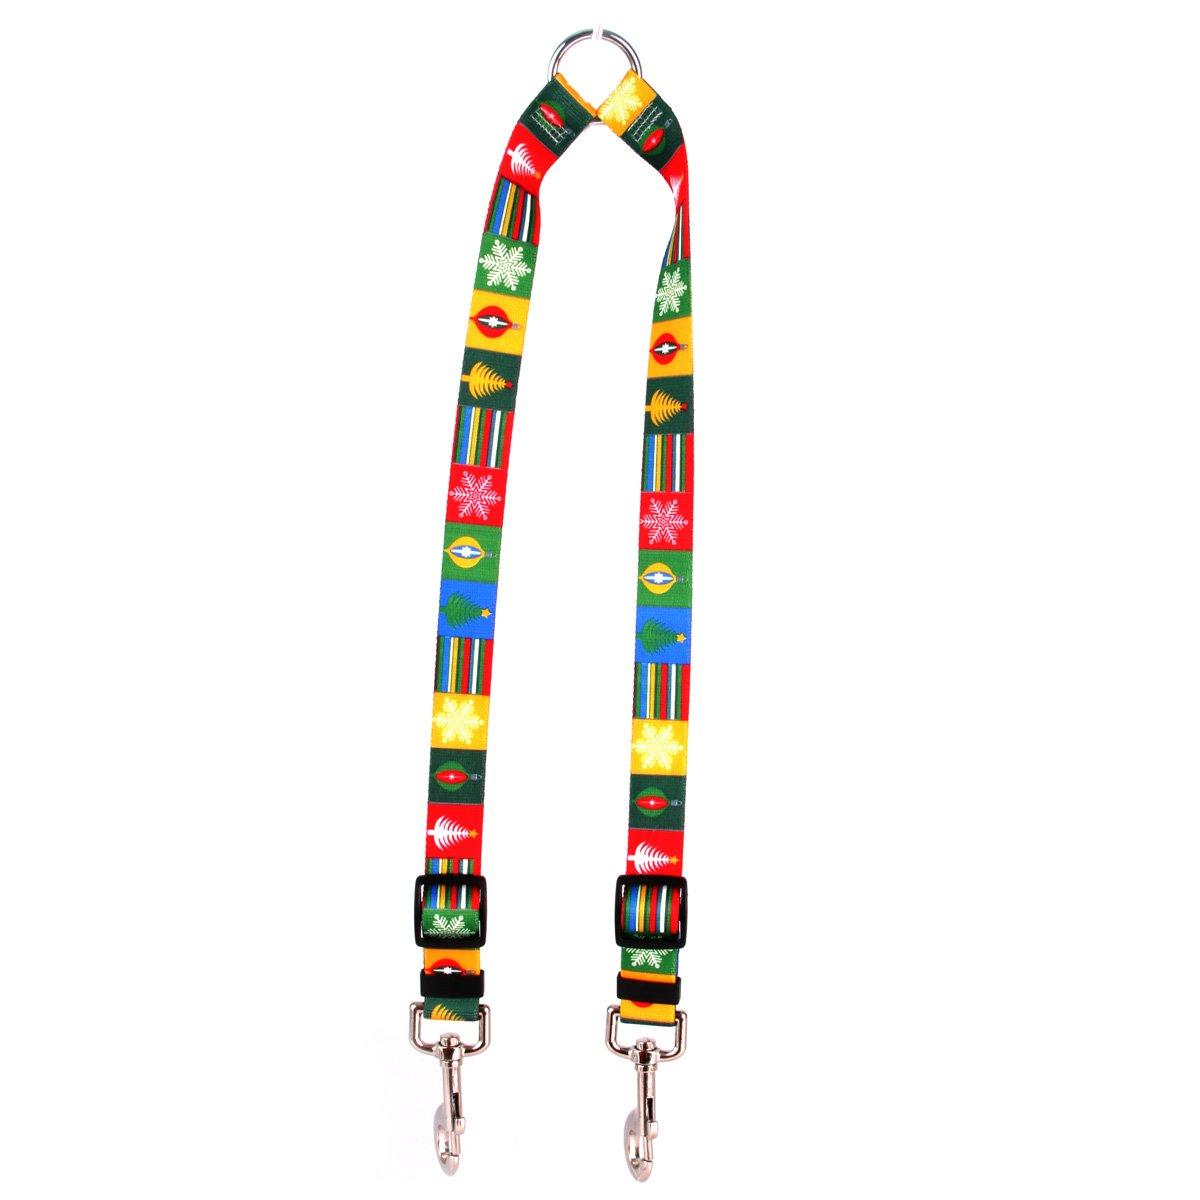 Large Yellow Dog Design Holiday Blocks Coupler Dog Leash 1  Wide And 12 To 20  Long, Large